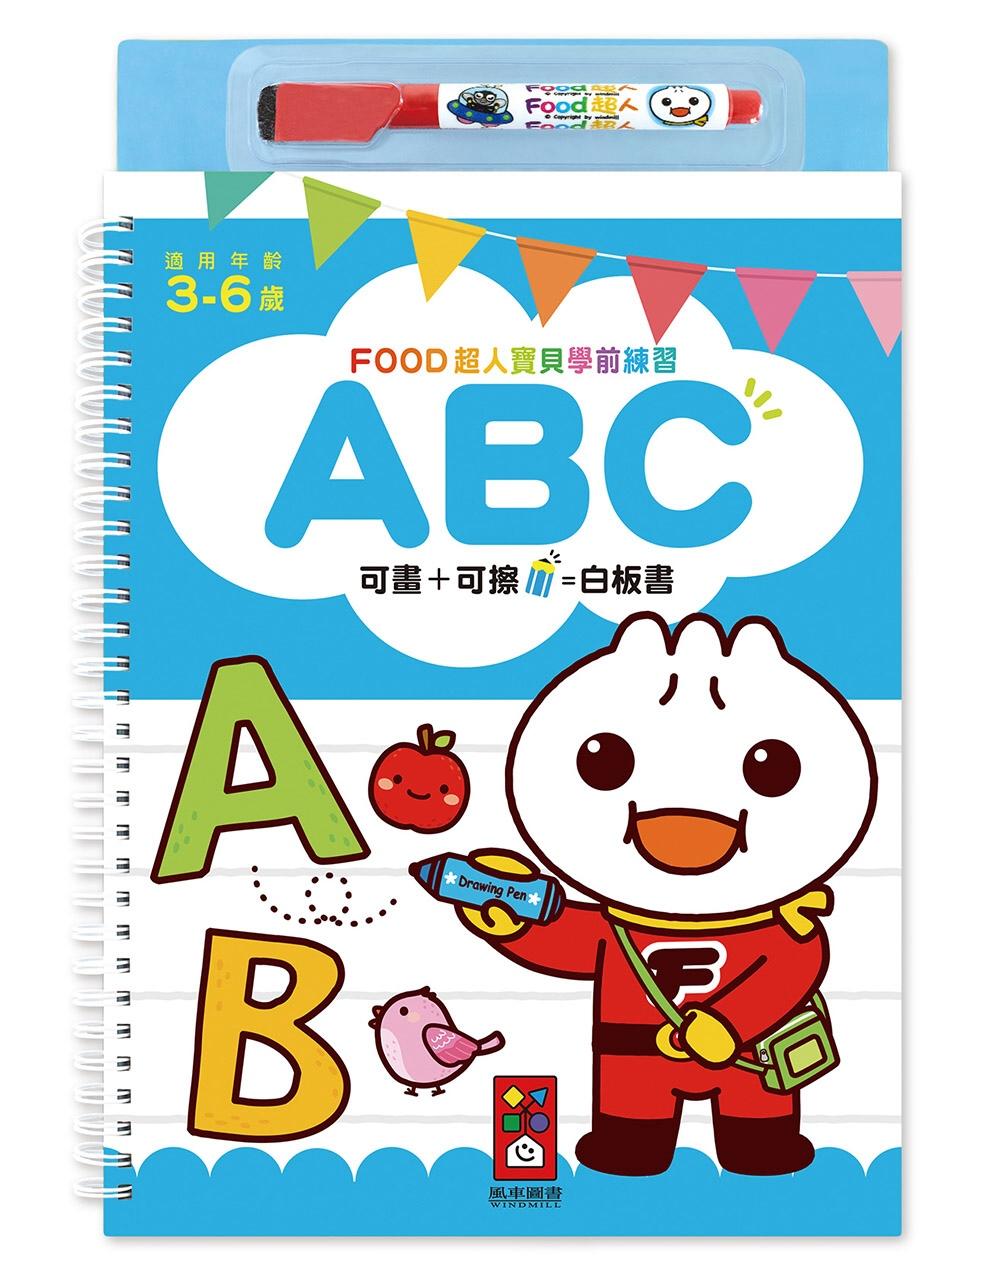 ABC:FOOD超人寶貝學前練習